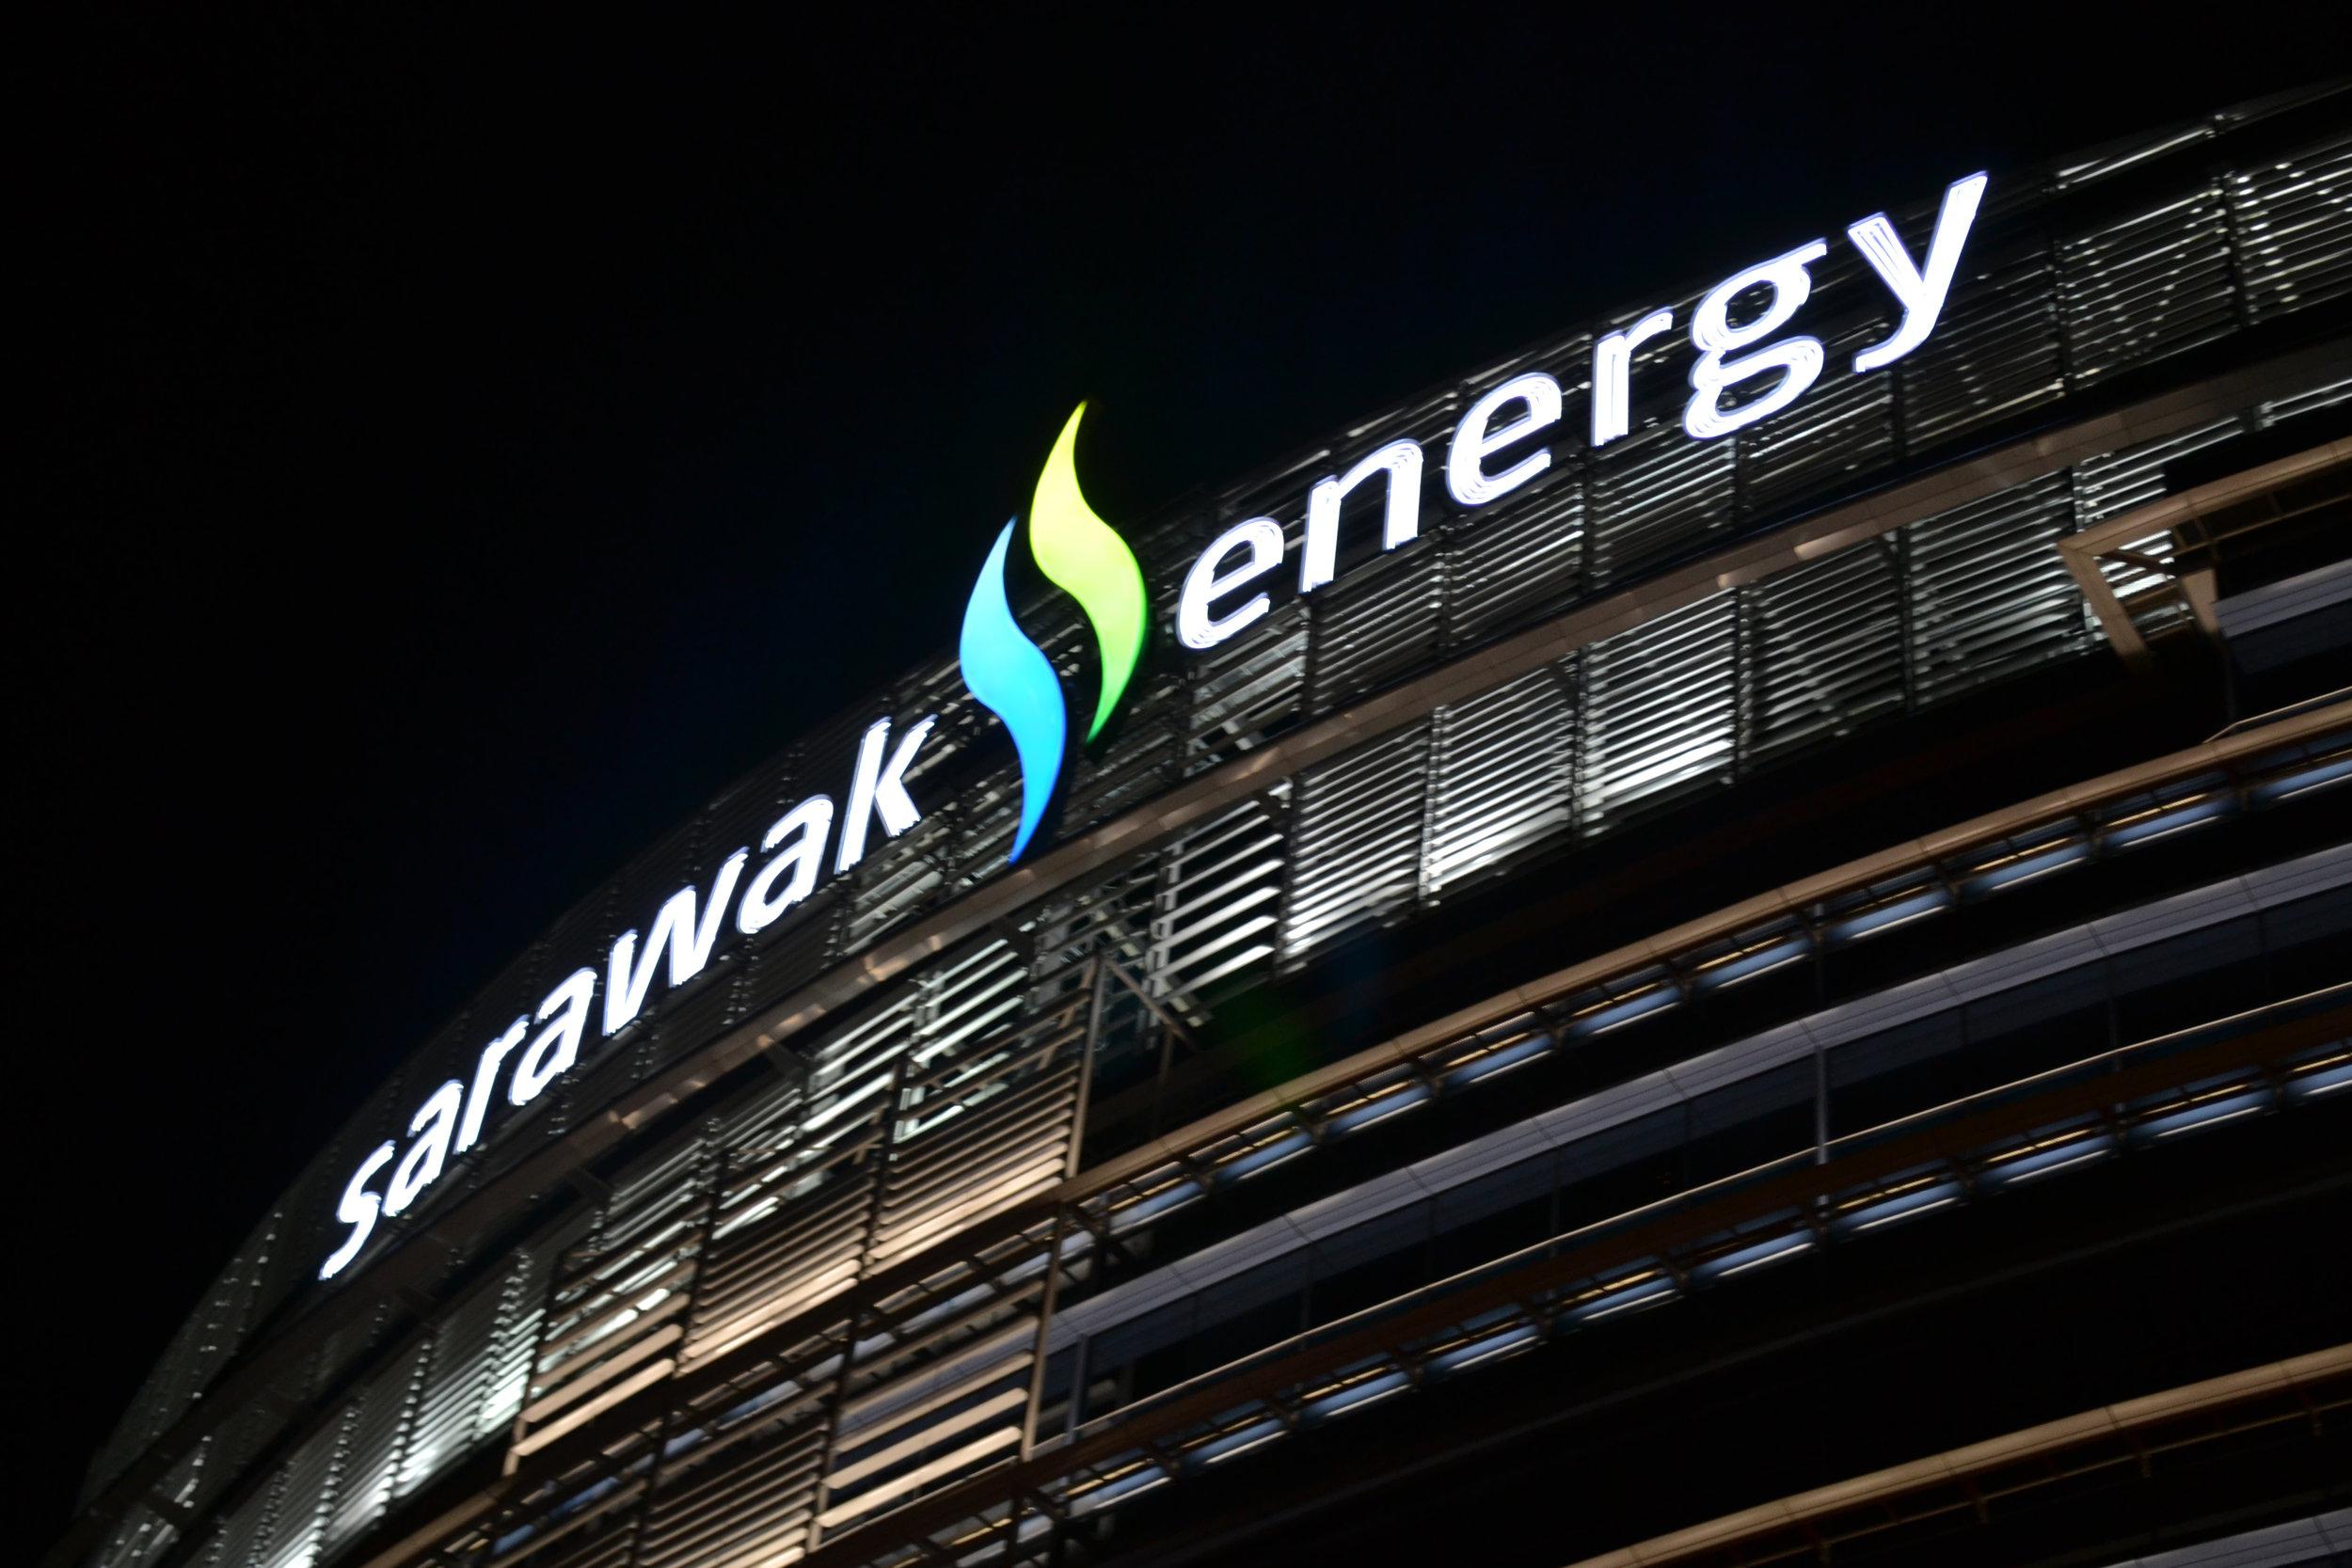 Sarawak Energy (2012, 2017)